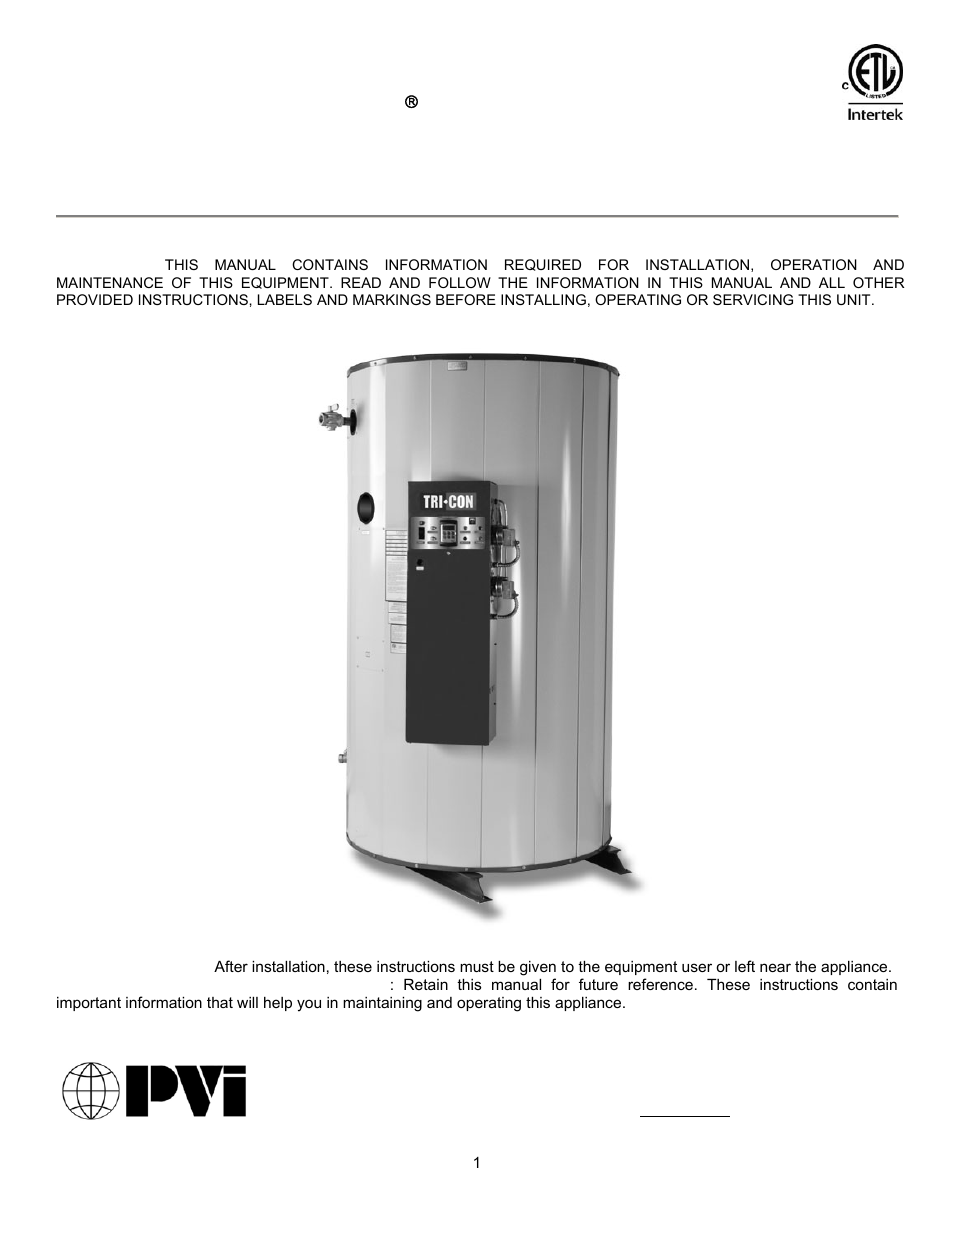 pvi boiler manuals enthusiast wiring diagrams u2022 rh rasalibre co Lochinvar Boilers Maxim PVI Water Heaters